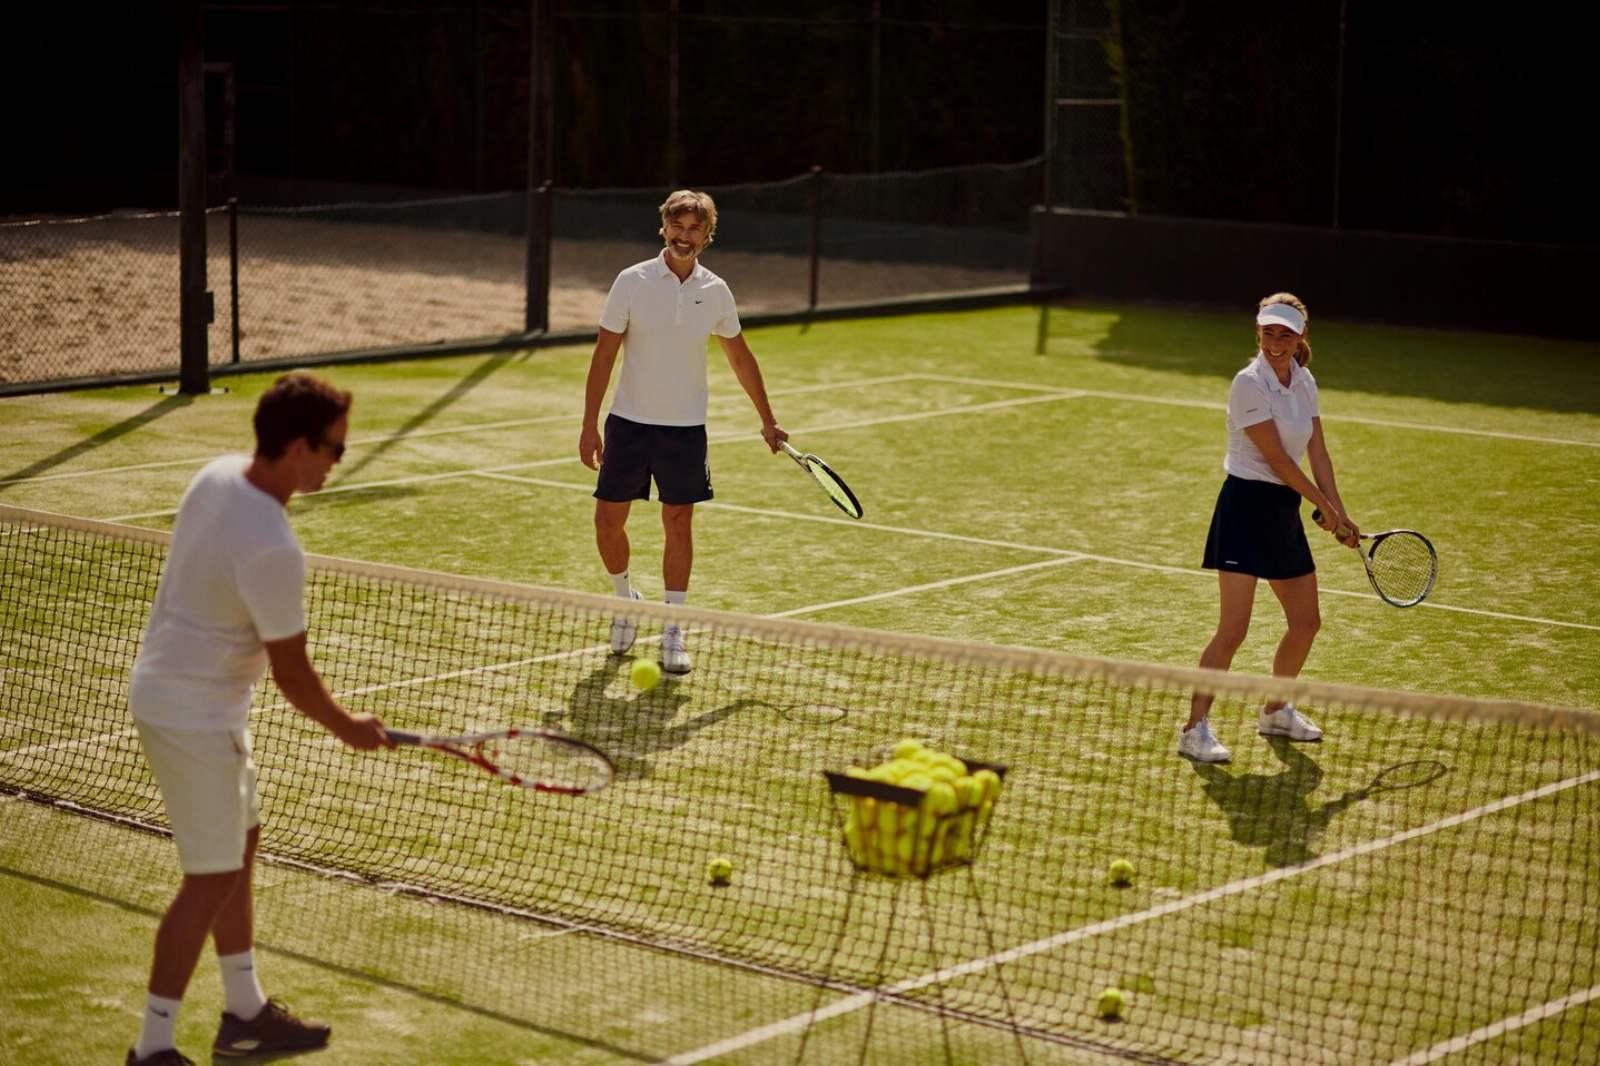 St. Regis Mardavall Resort - Tennis Court